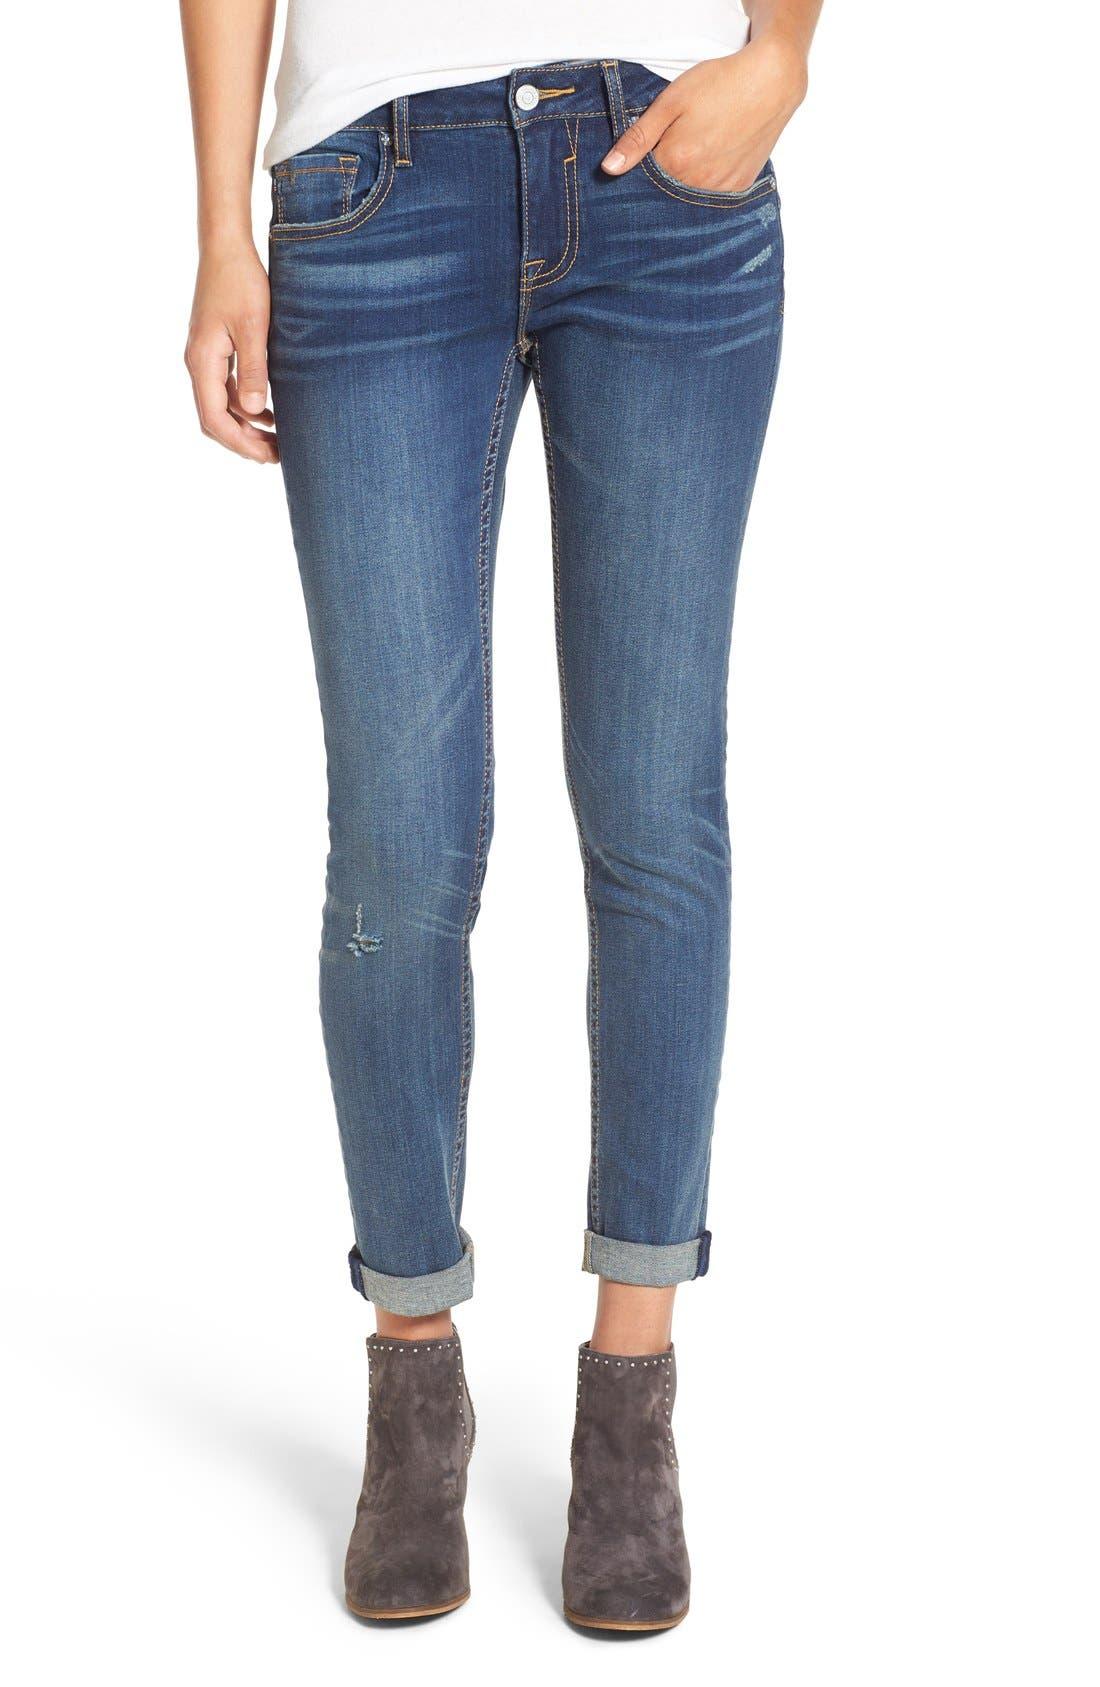 VIGOSS 'Thompson' Distressed Skinny Jeans, Main, color, 400